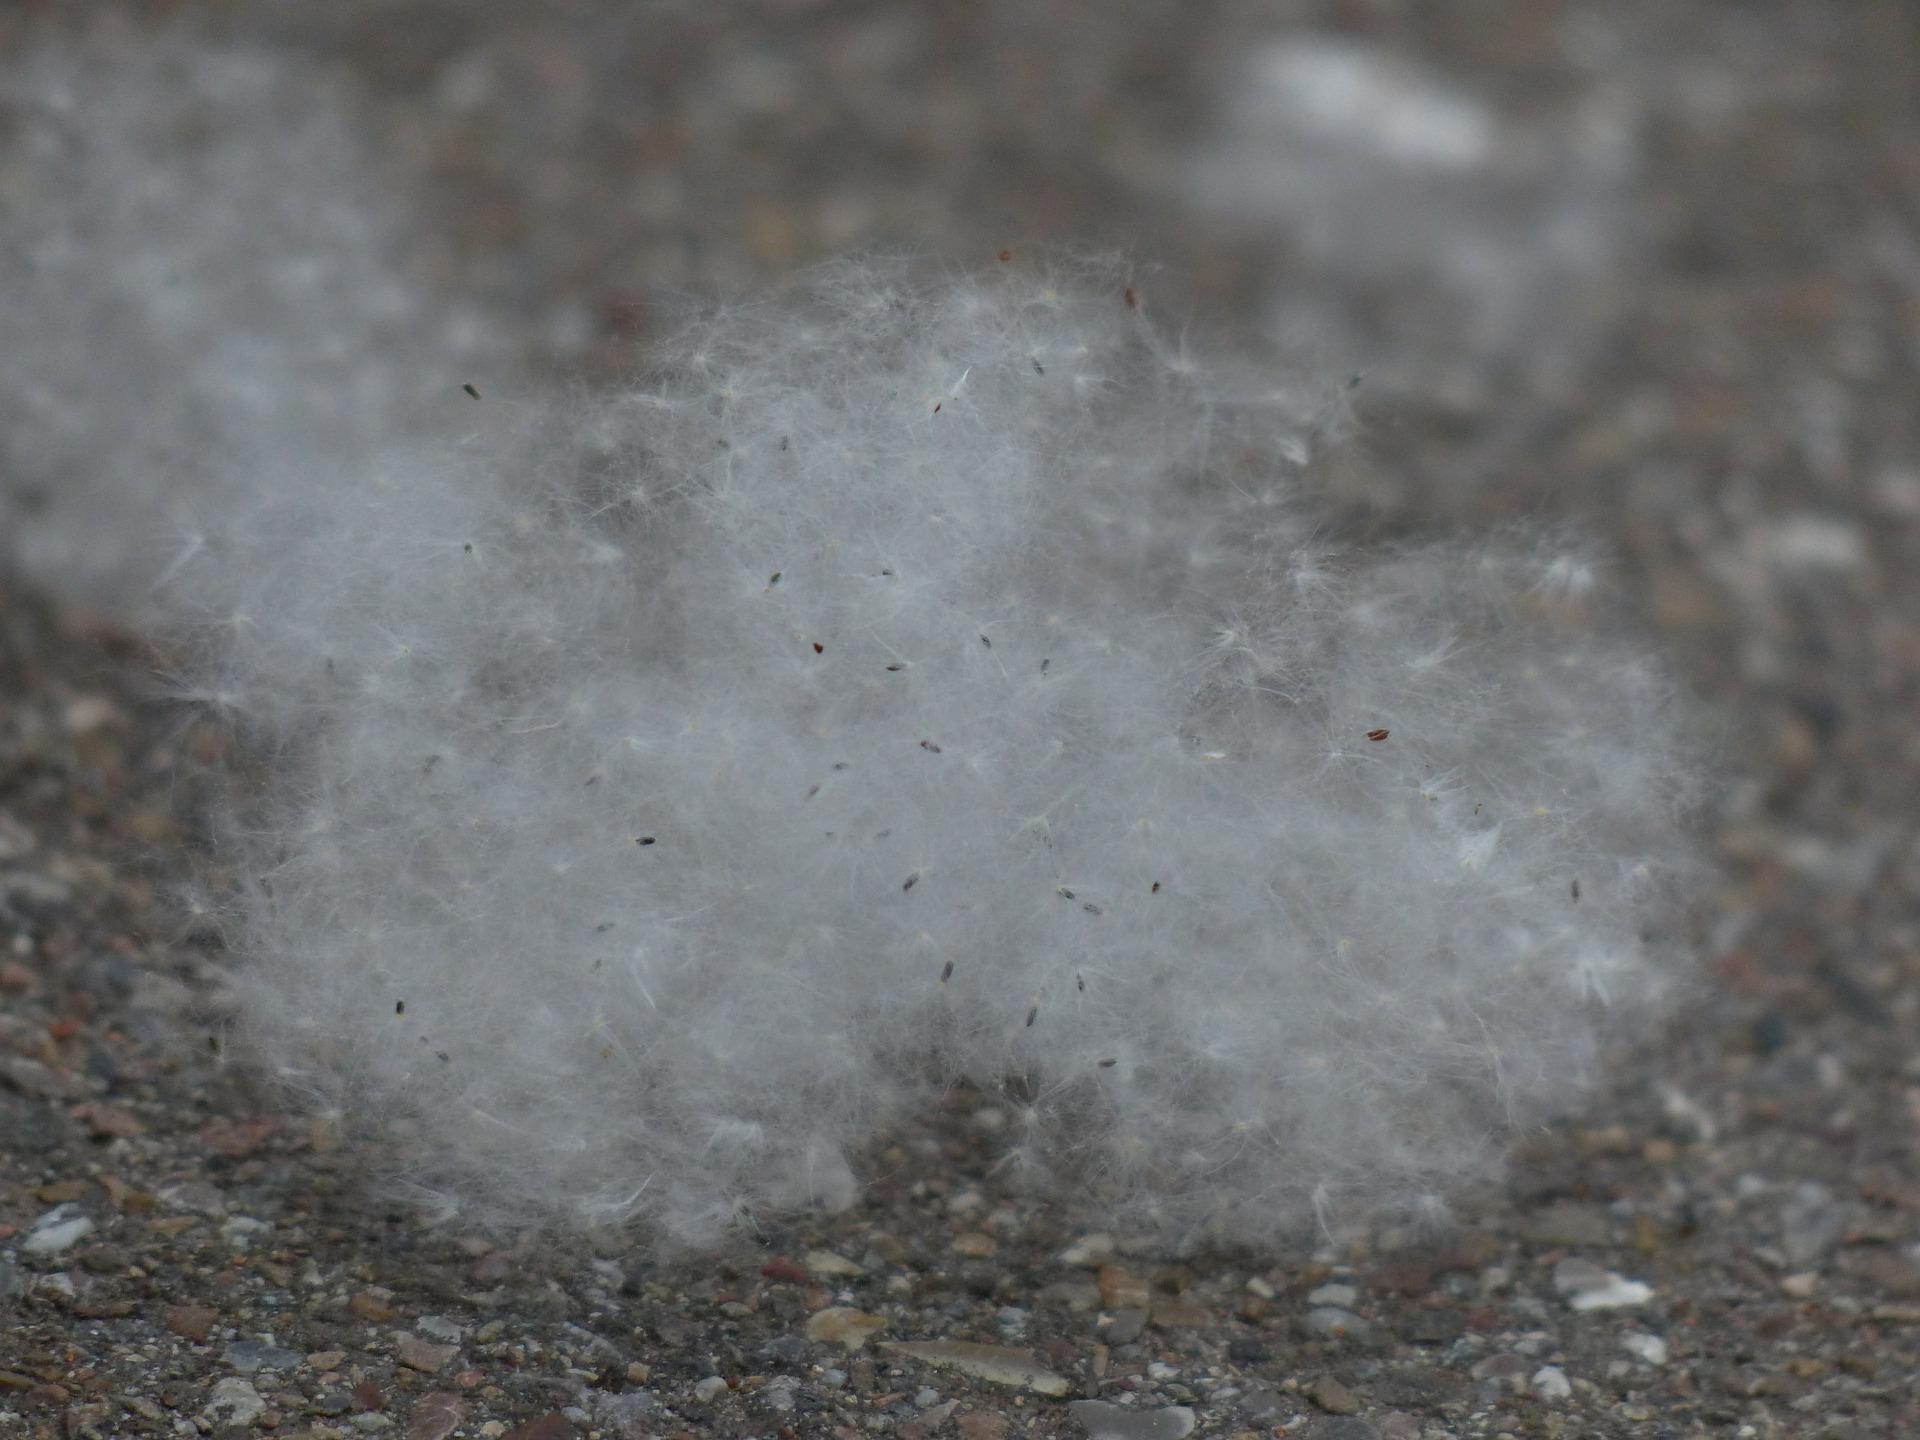 Poplar-seeds-143436 1920.jpg